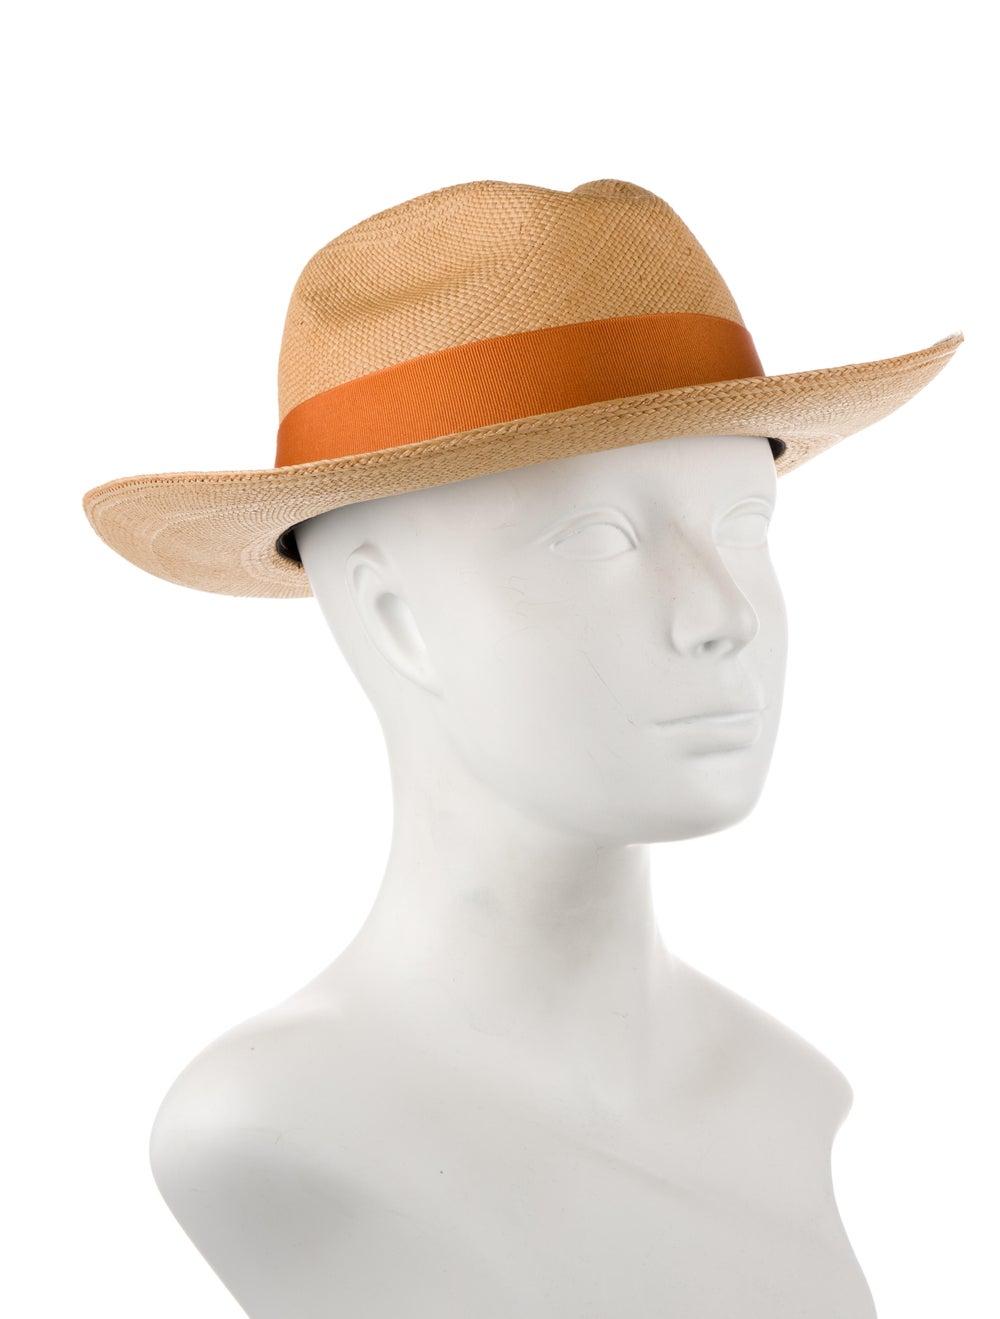 Artesano Straw Wide Brim Hat orange - image 3